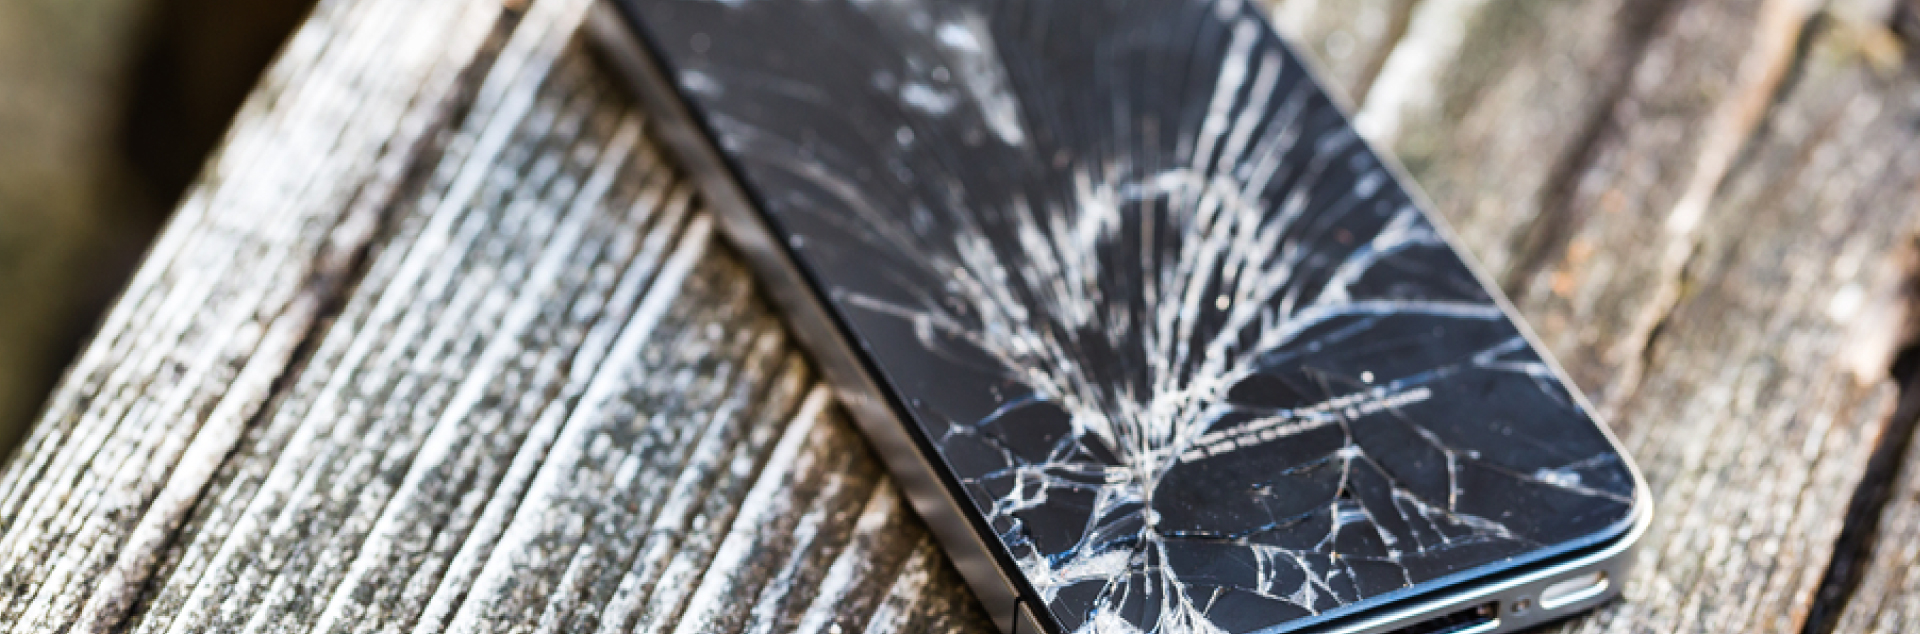 iPhoneの画面割れを即日修理!兵庫でおすすめのiPhone修理店6選